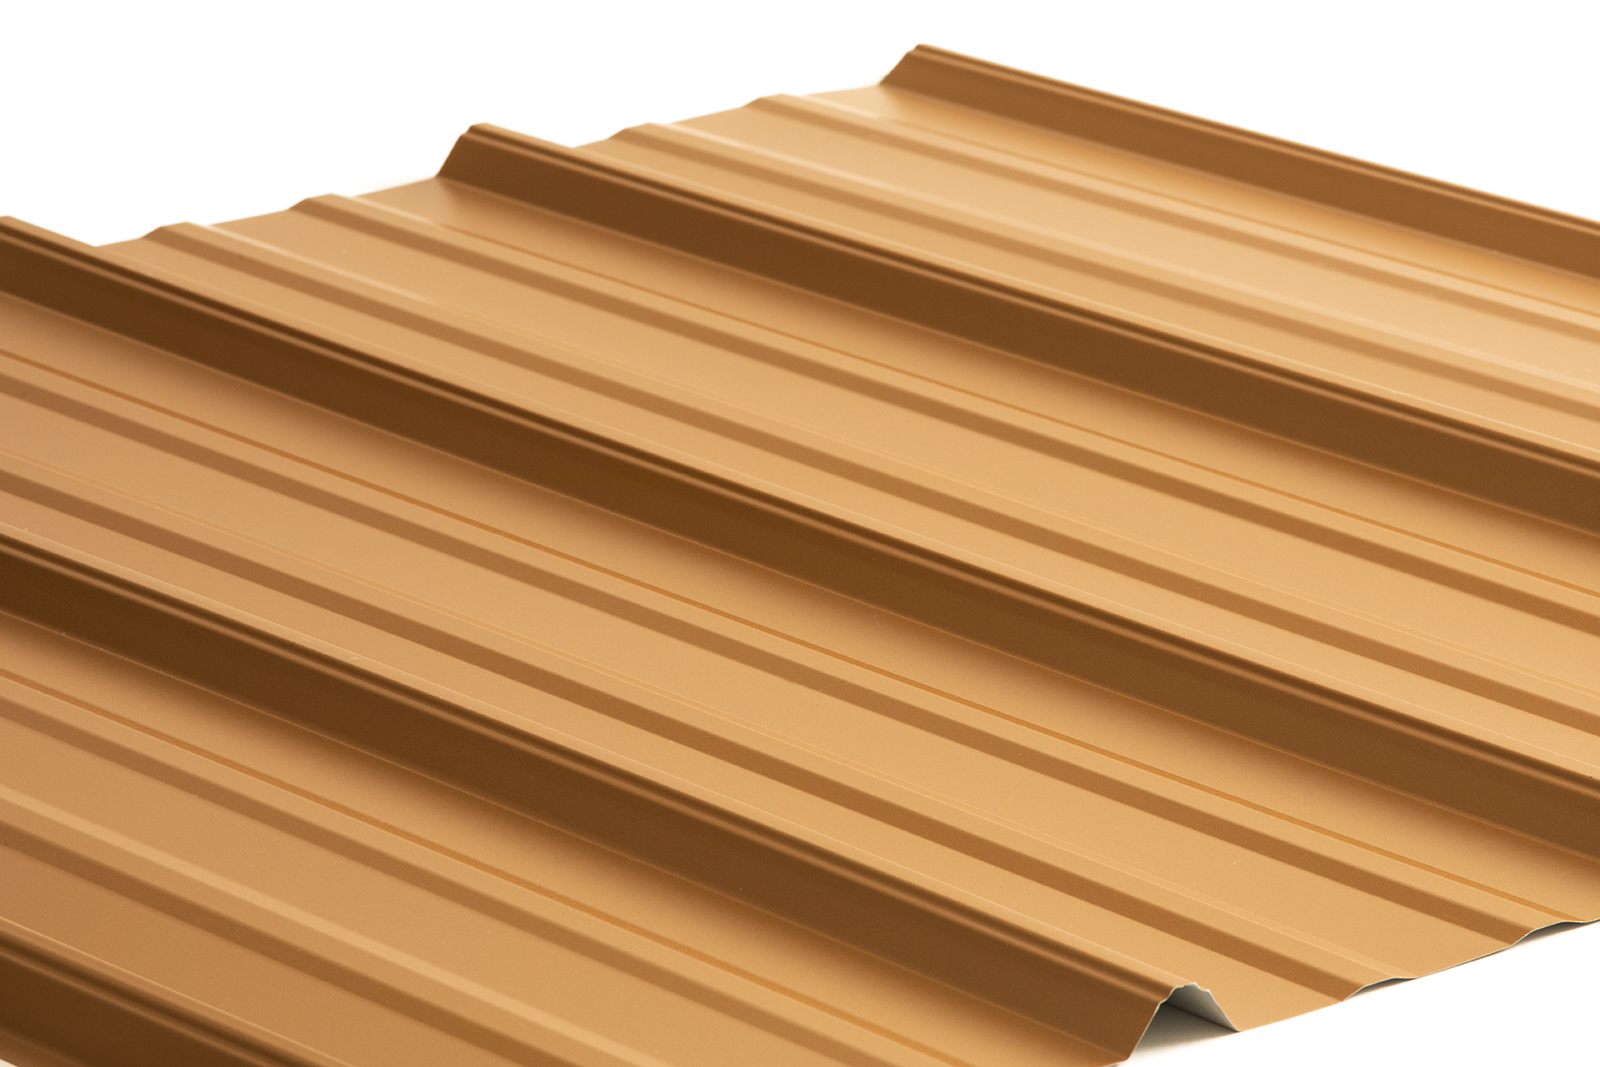 Classic Metal Rib Roofing Material